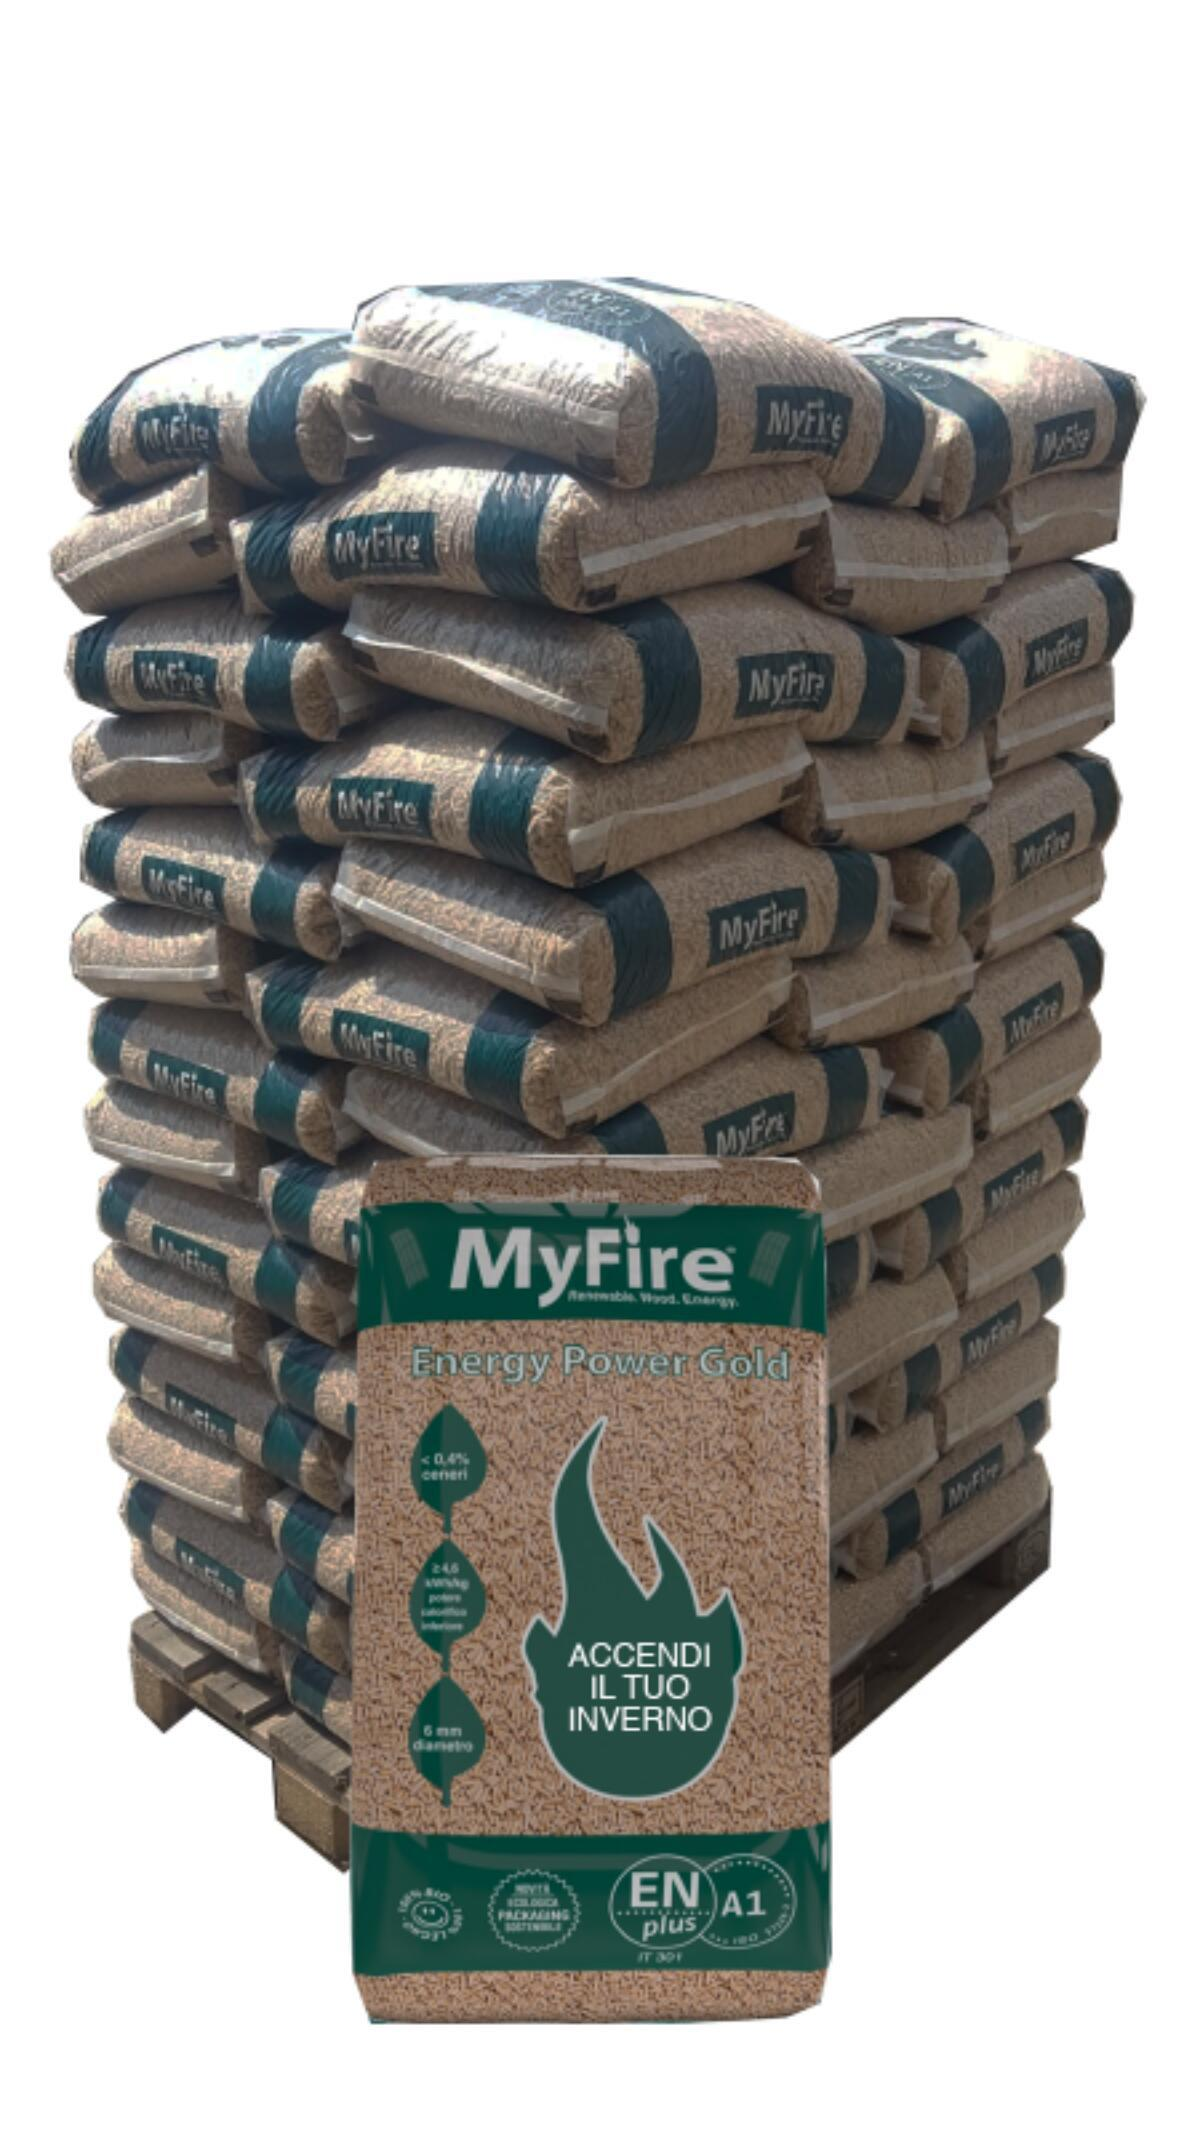 Pellet MyFire Energy Power ENplus A1 70 sacchi da 15 kg in pino e abete - 4